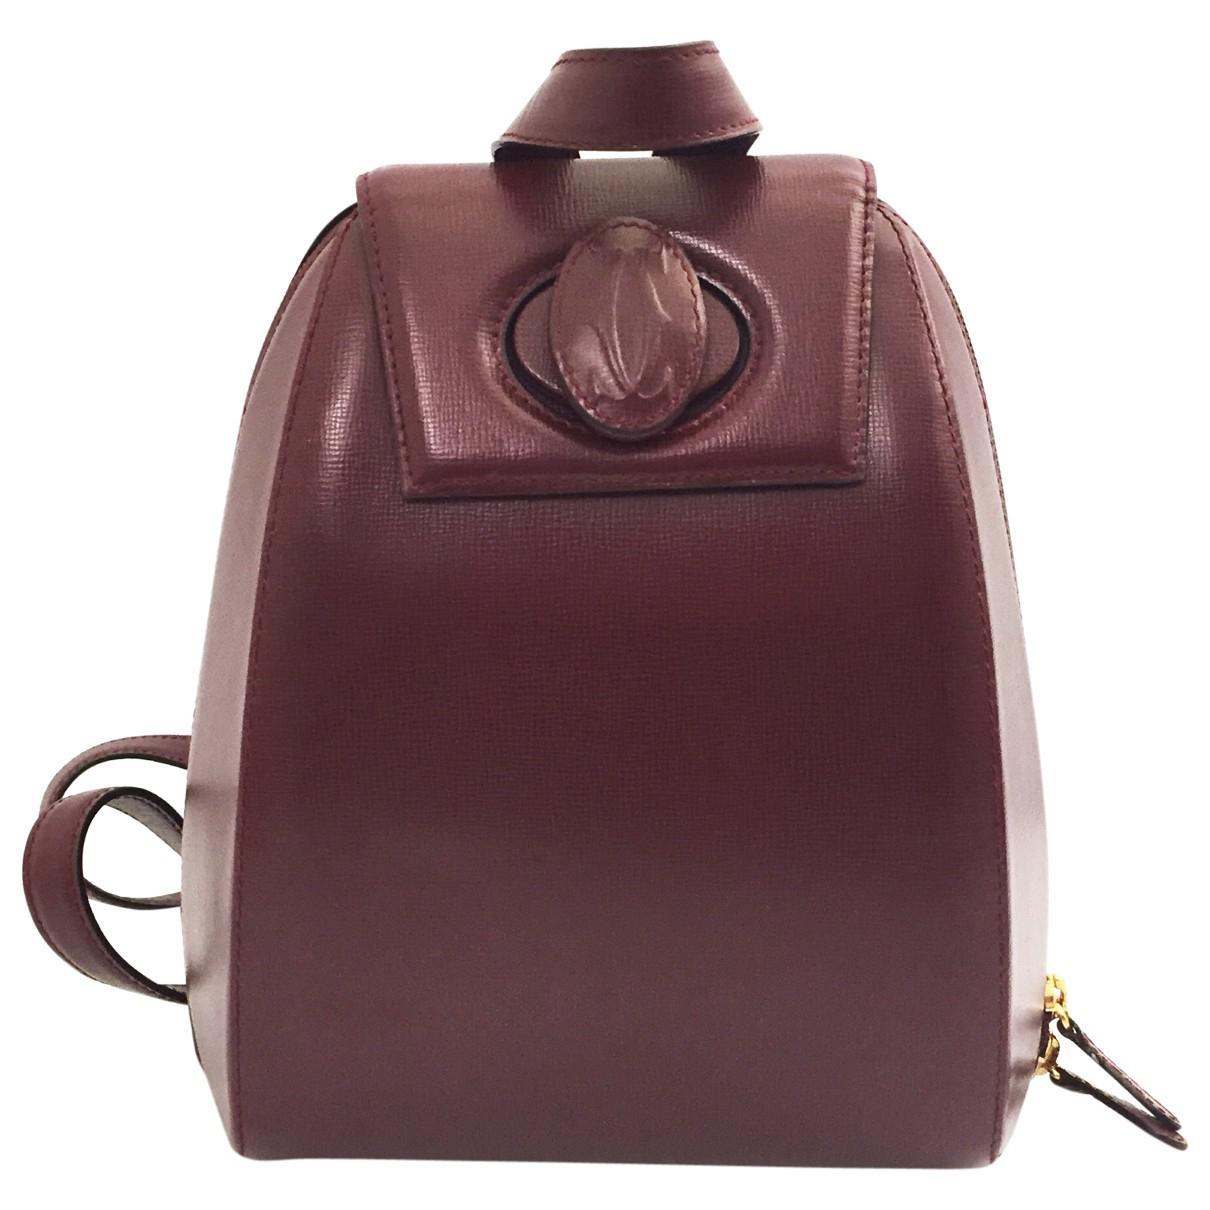 Cartier Pre-owned - Leather backpack El7kYKK